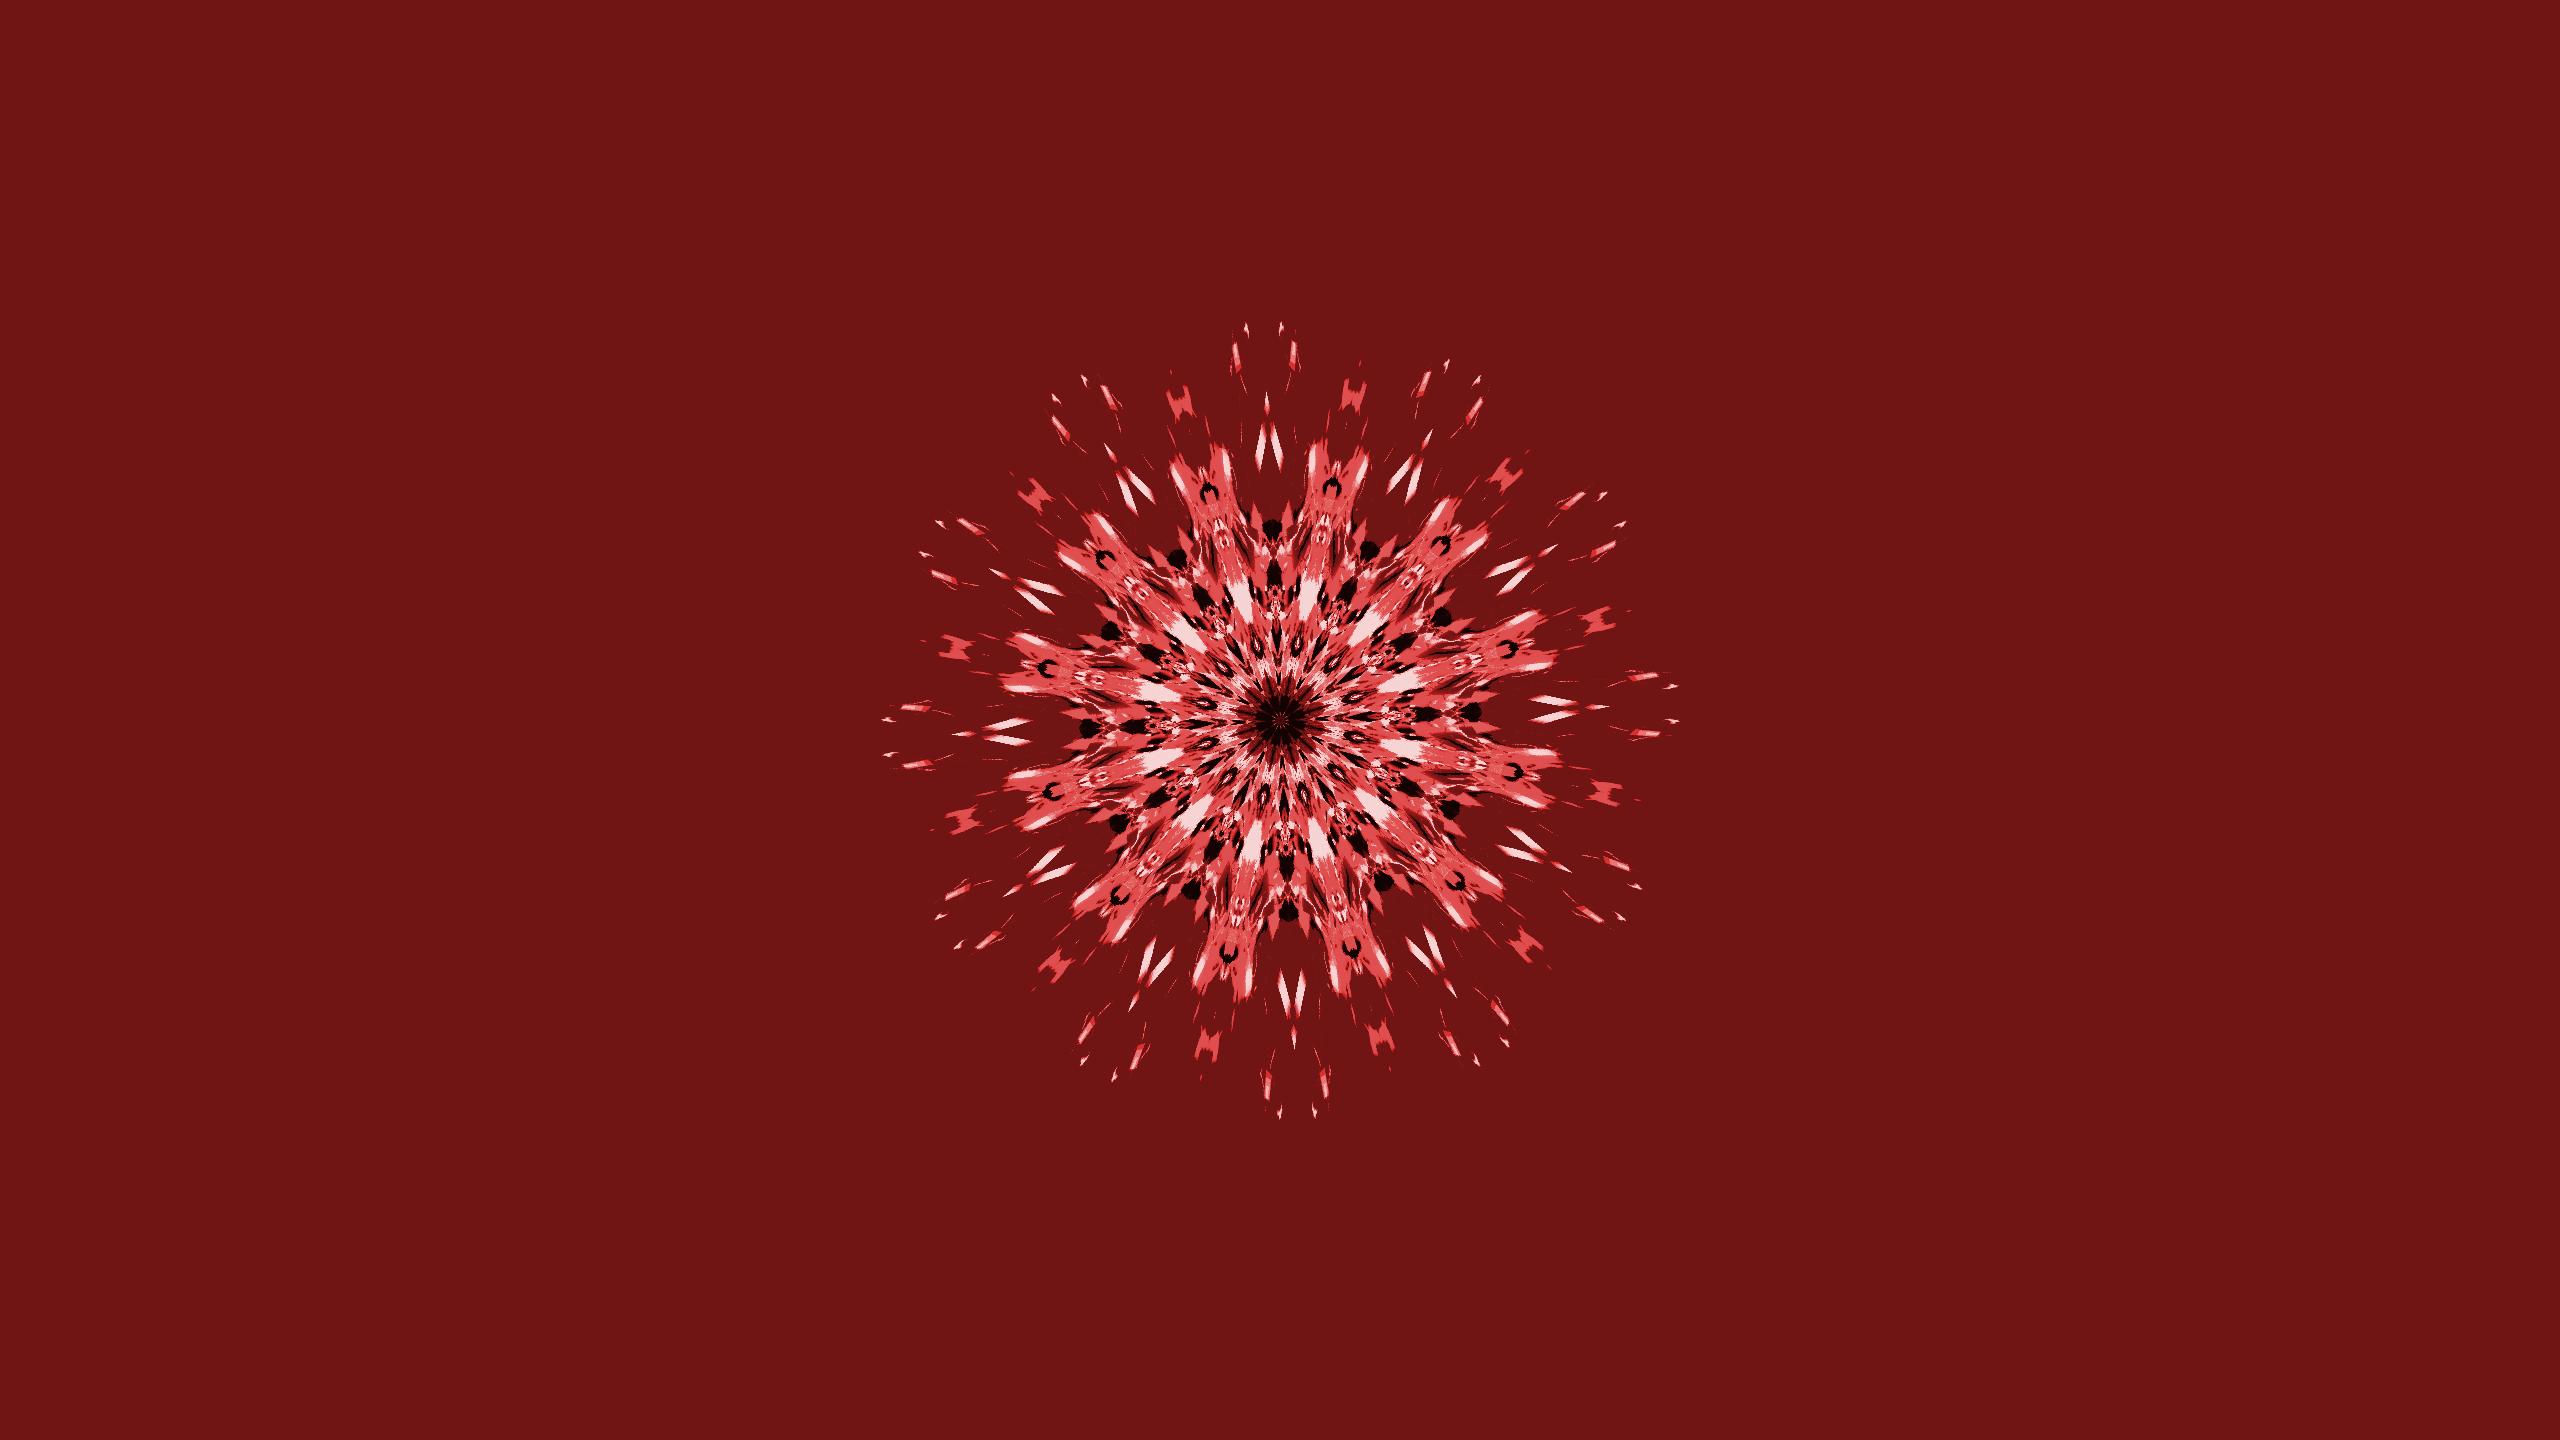 Red Kaleidoscope Art Fond Décran Hd Arrière Plan